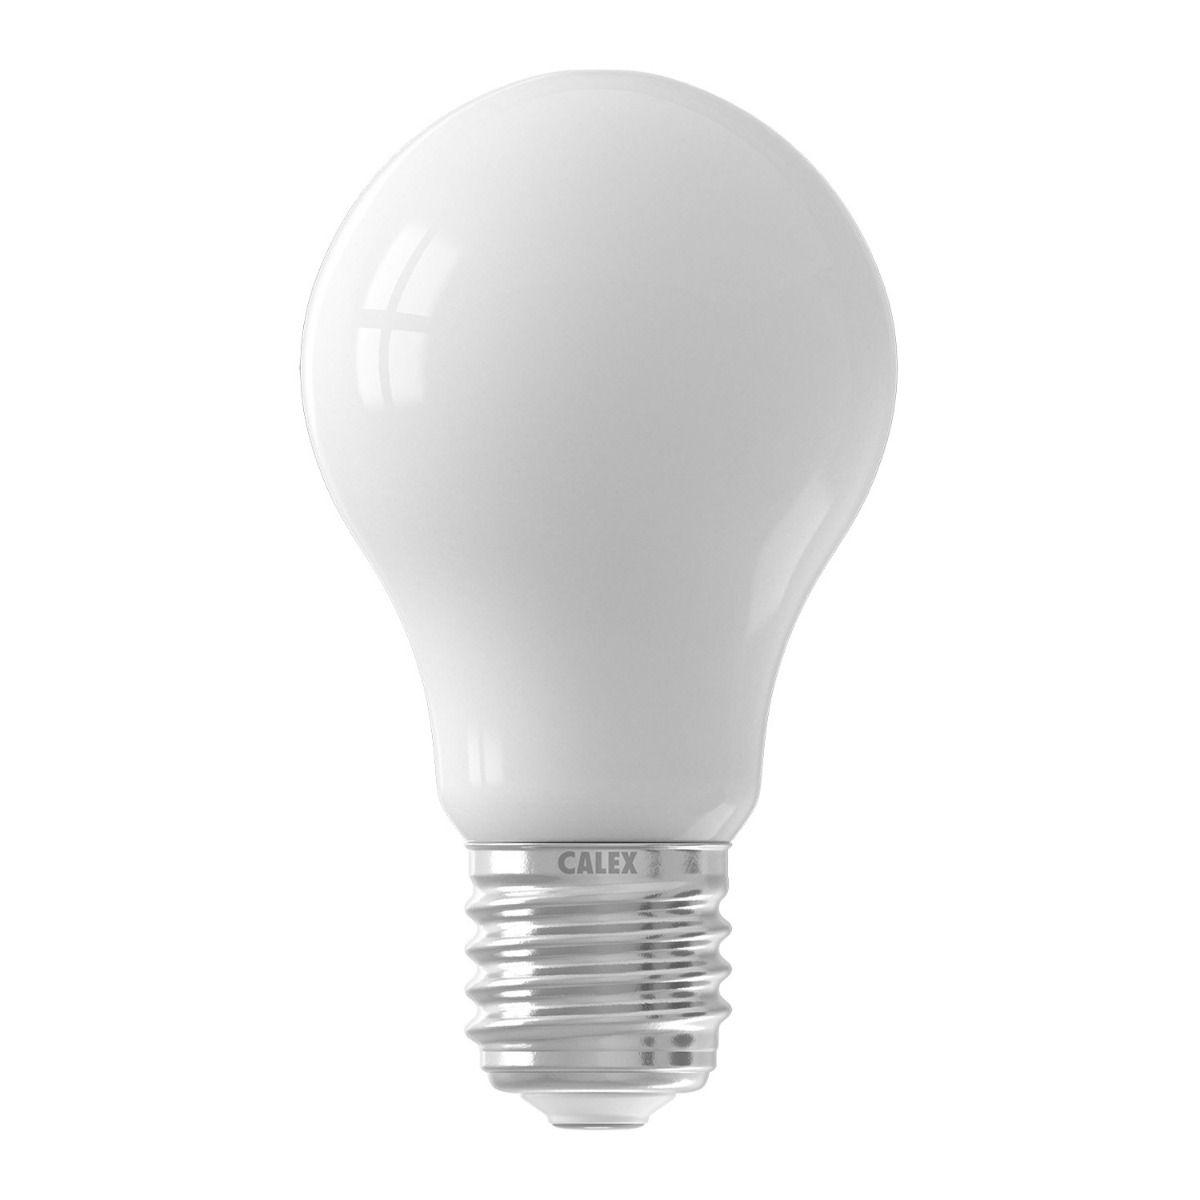 Calex Smart Standaard LED Lamp E27 7W 806lm 2200-4000K | Tuya Wifi - Afstembaar Wit